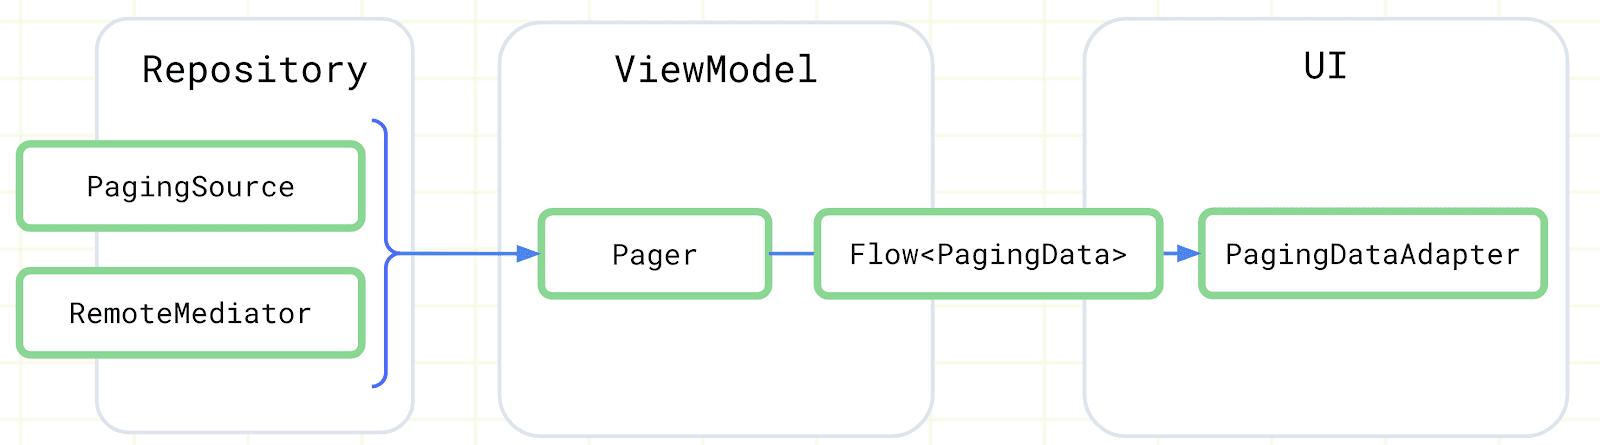 Paging 组件及其在应用架构的集成